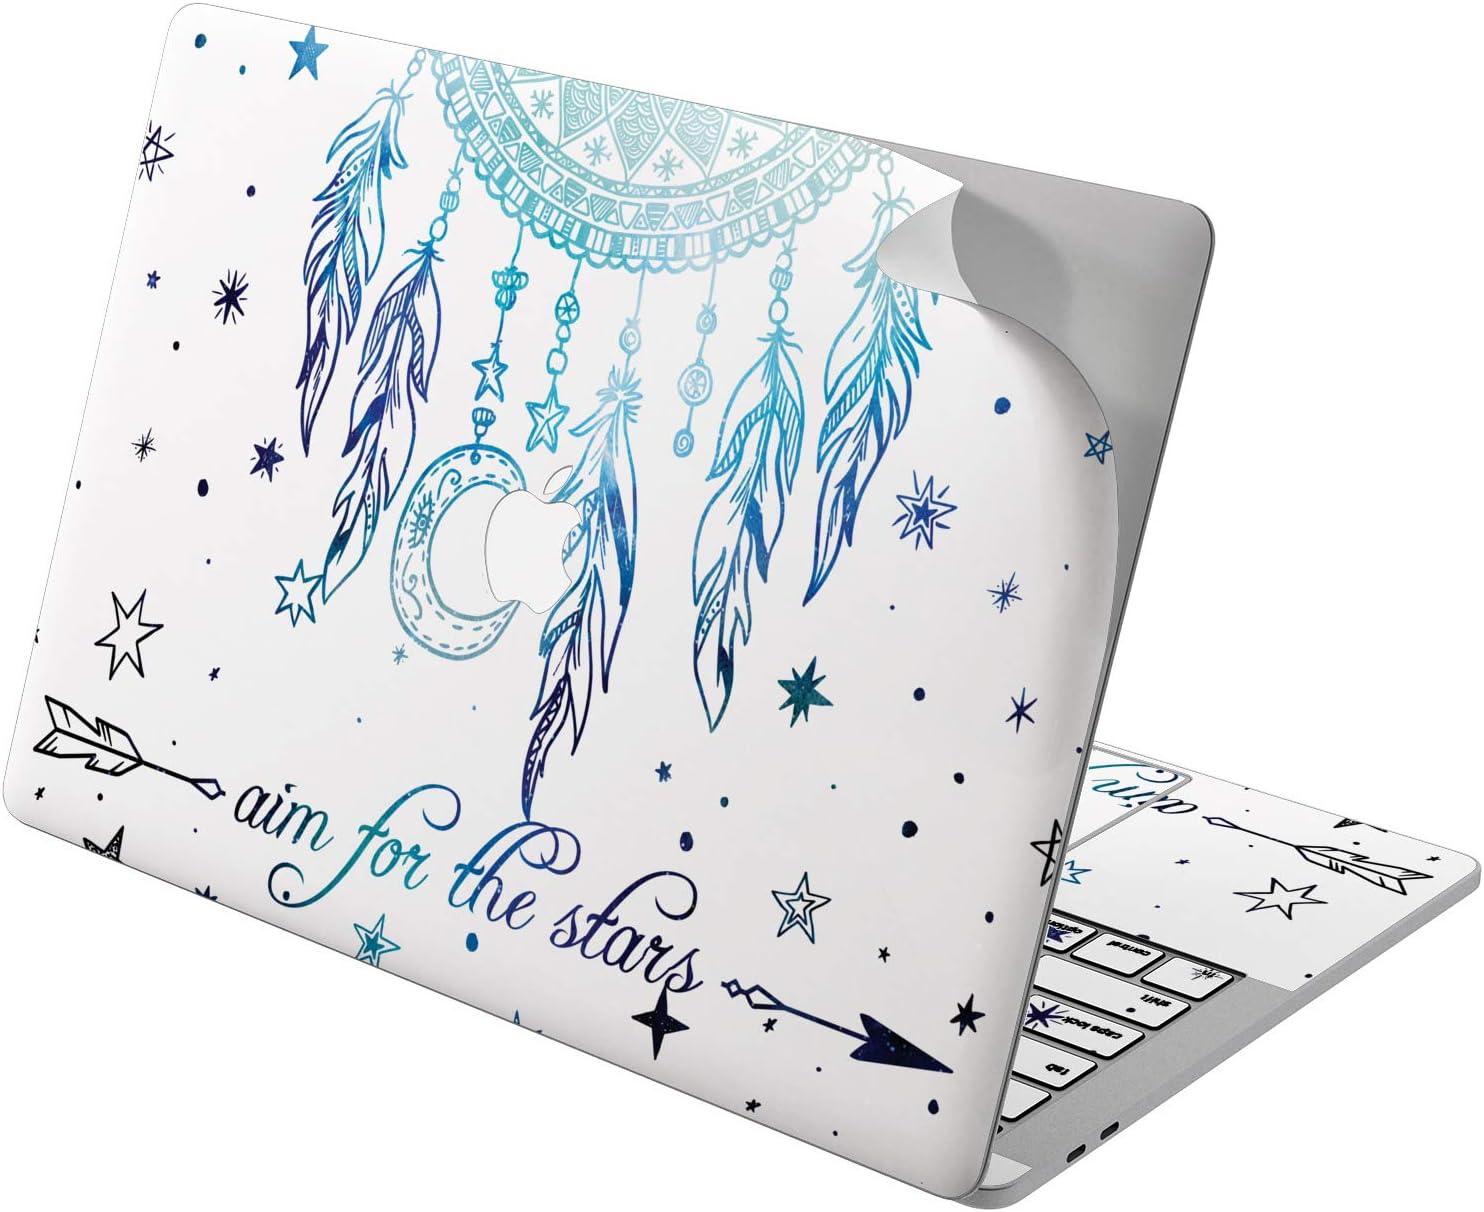 "Cavka Vinyl Decal Skin for Apple MacBook Pro 13"" 2019 15"" 2018 Air 13"" 2020 Retina 2015 Mac 11"" Mac 12"" Laptop Dreamcatcher Stars Sticker Boho Cover Colorful Protective Feather Design Purple Print"